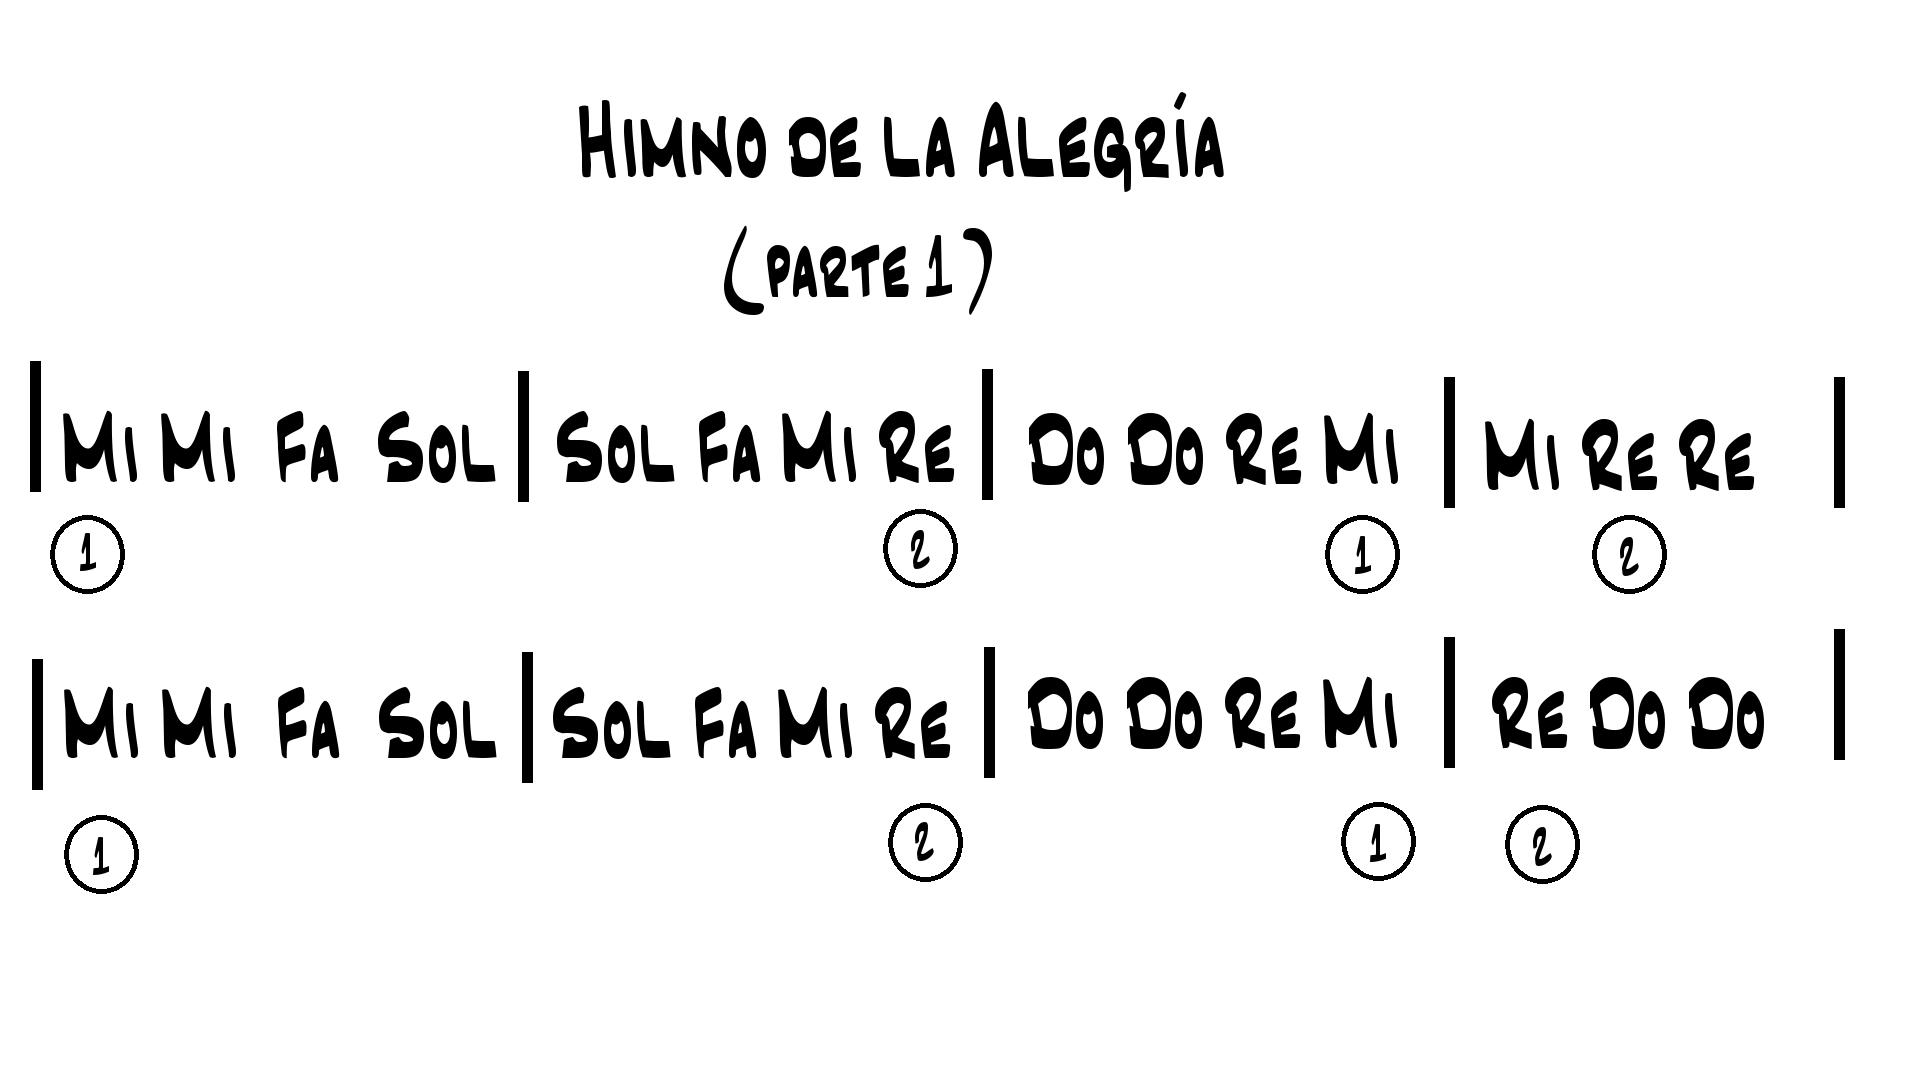 Himno de la alegr a para guitarra ac stica tutorial pr ctico for Cancion el jardin de la alegria